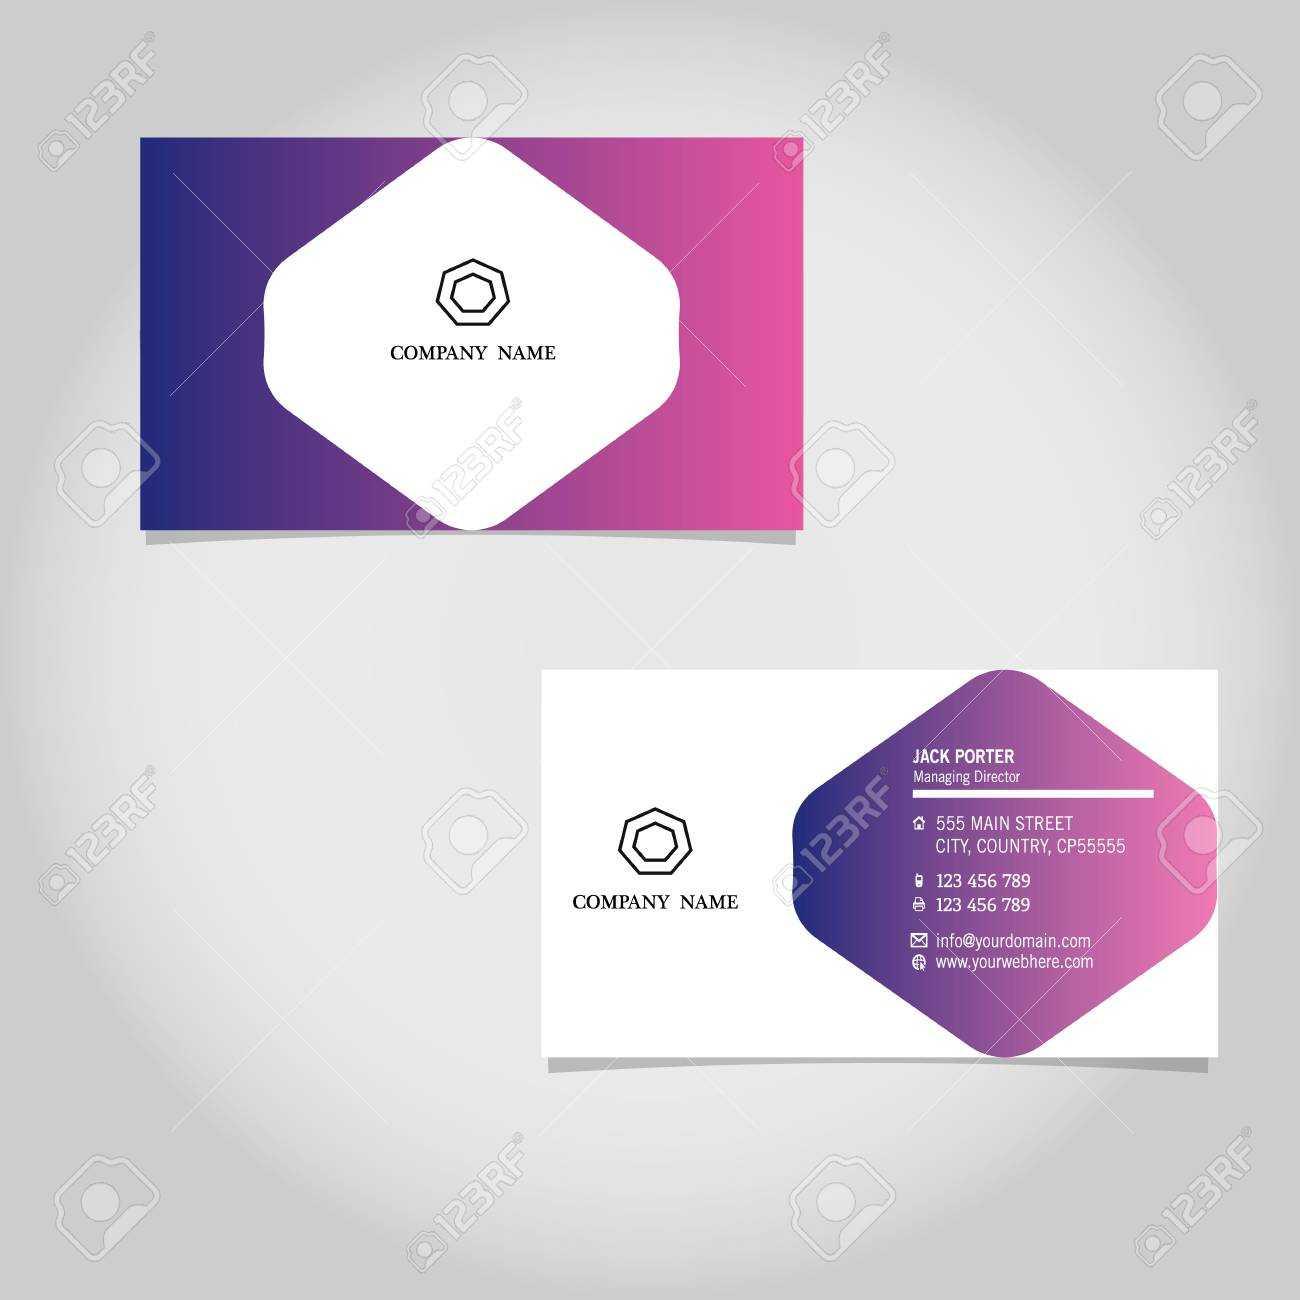 Vector Business Card Template Design Adobe Illustrator Inside Adobe Illustrator Business Card Template